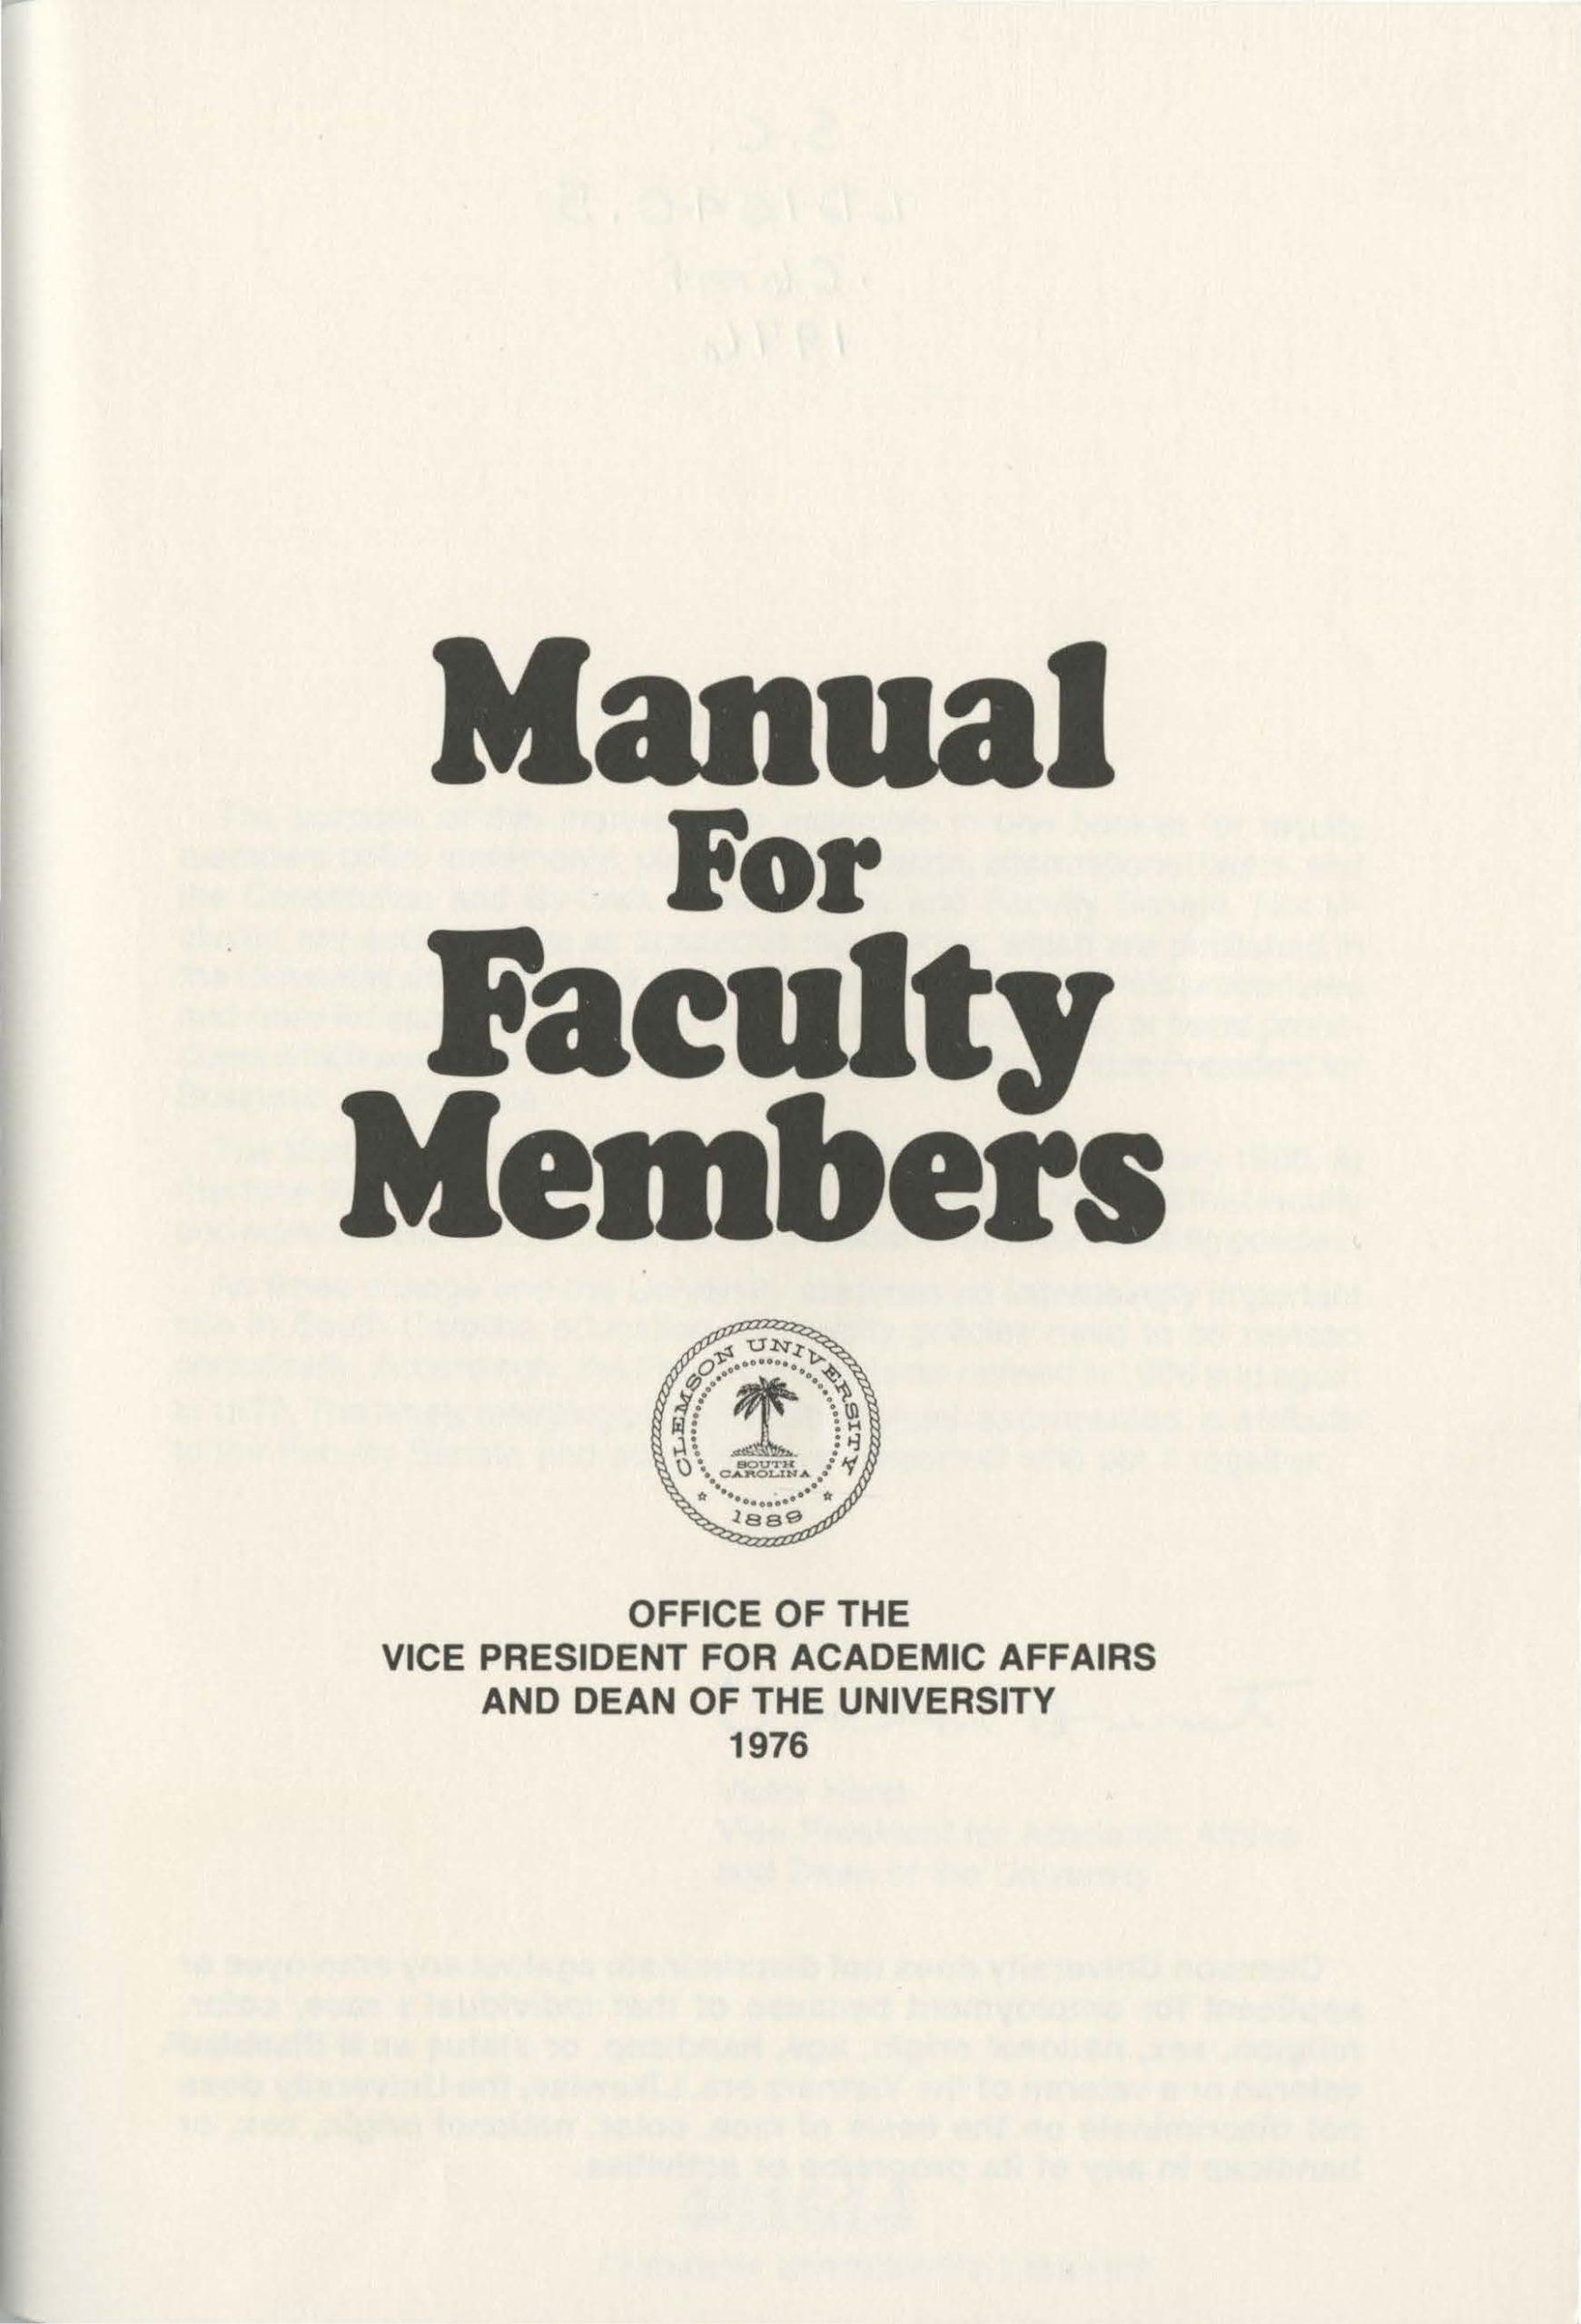 Clemson Faculty Manuals